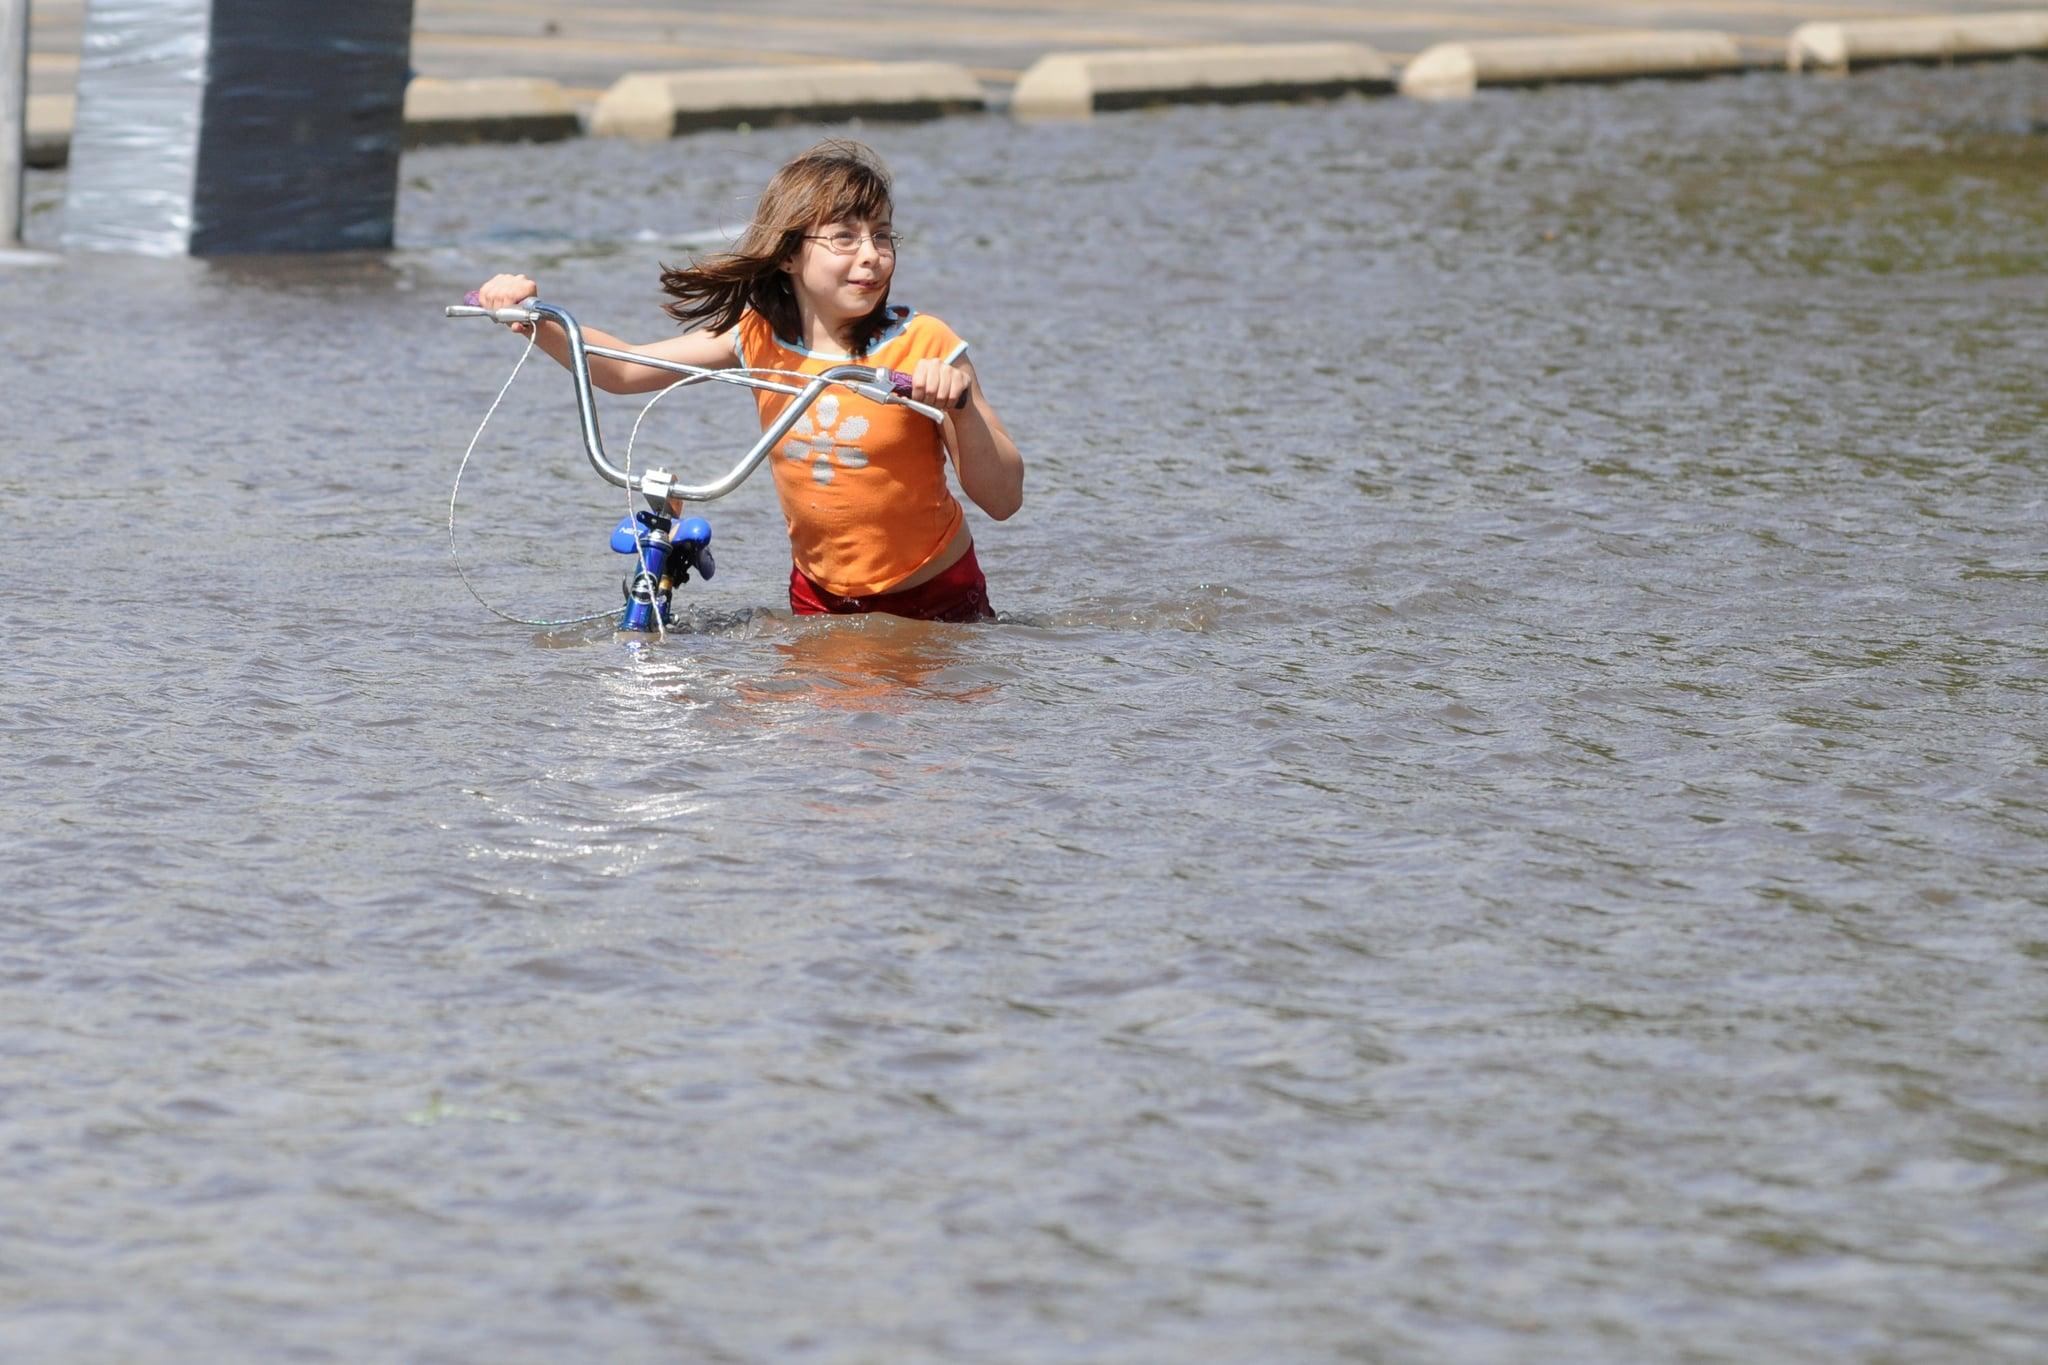 Gabrielle Steenblock, 8, walks across a flooded street near downtown Cedar Rapids.